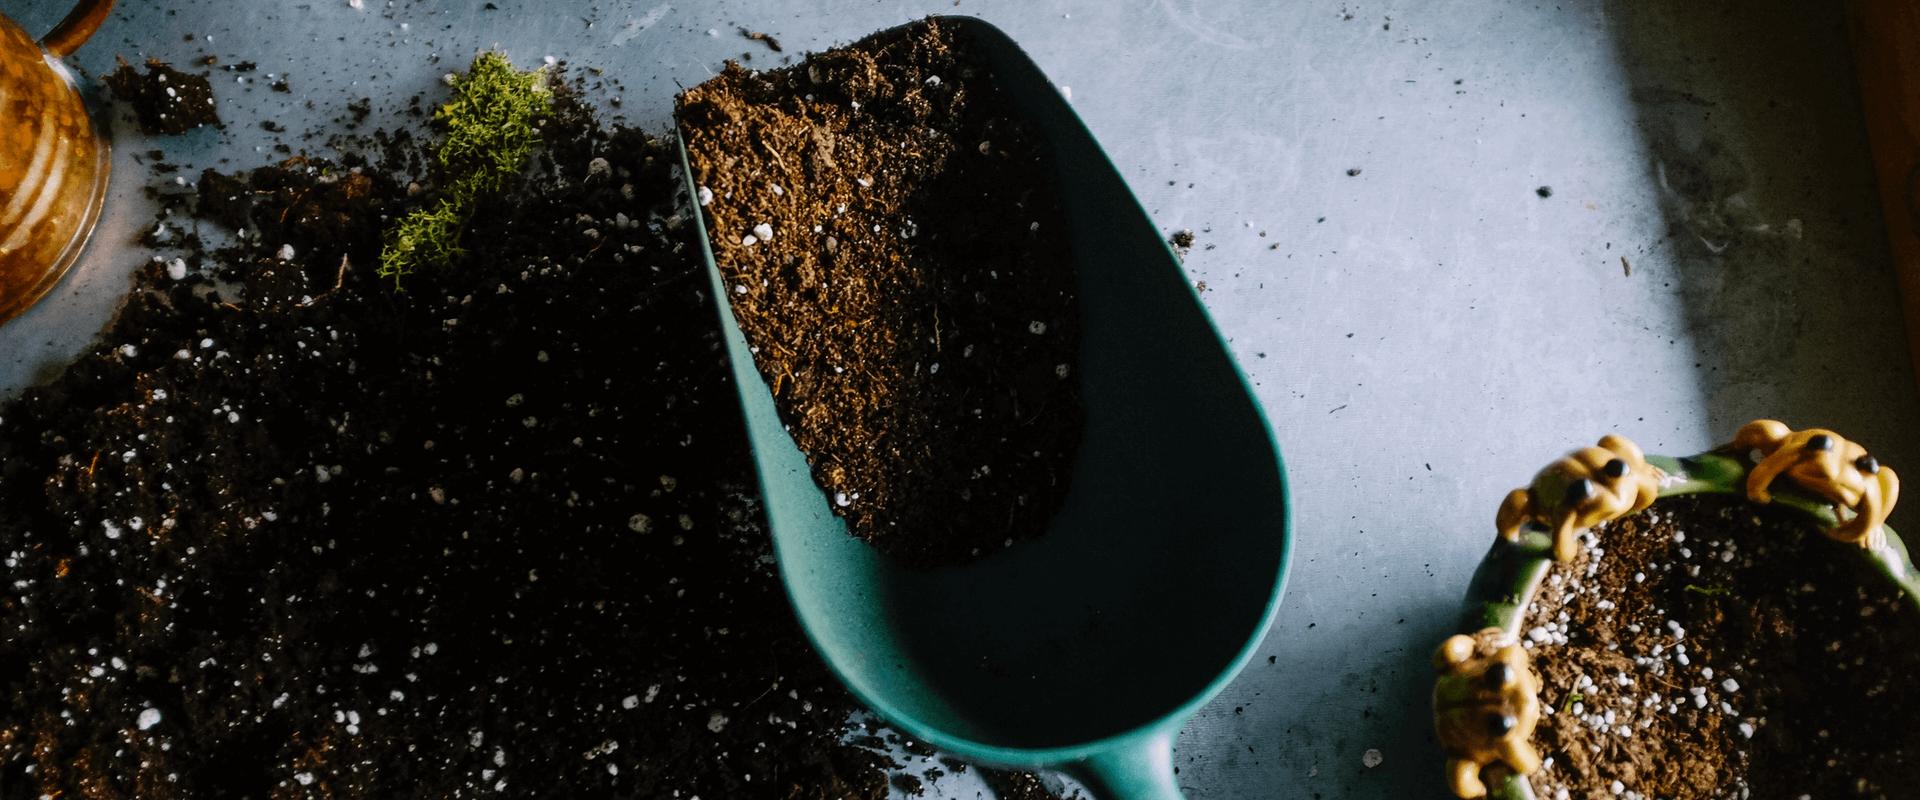 bluesky organics custom soil blends and amendments